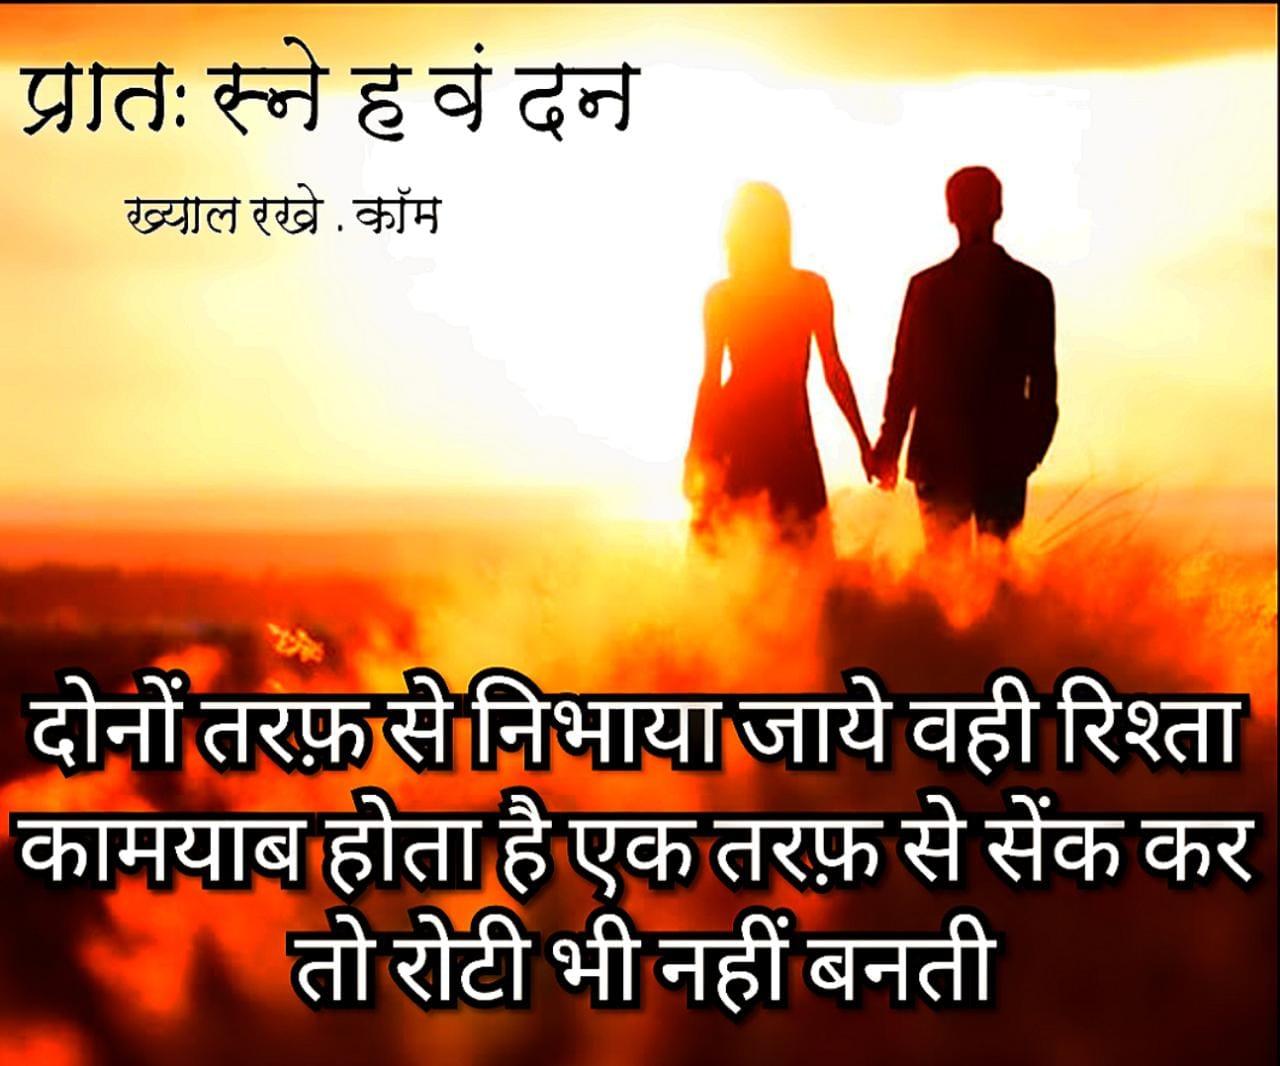 good morning dp in hindi - images